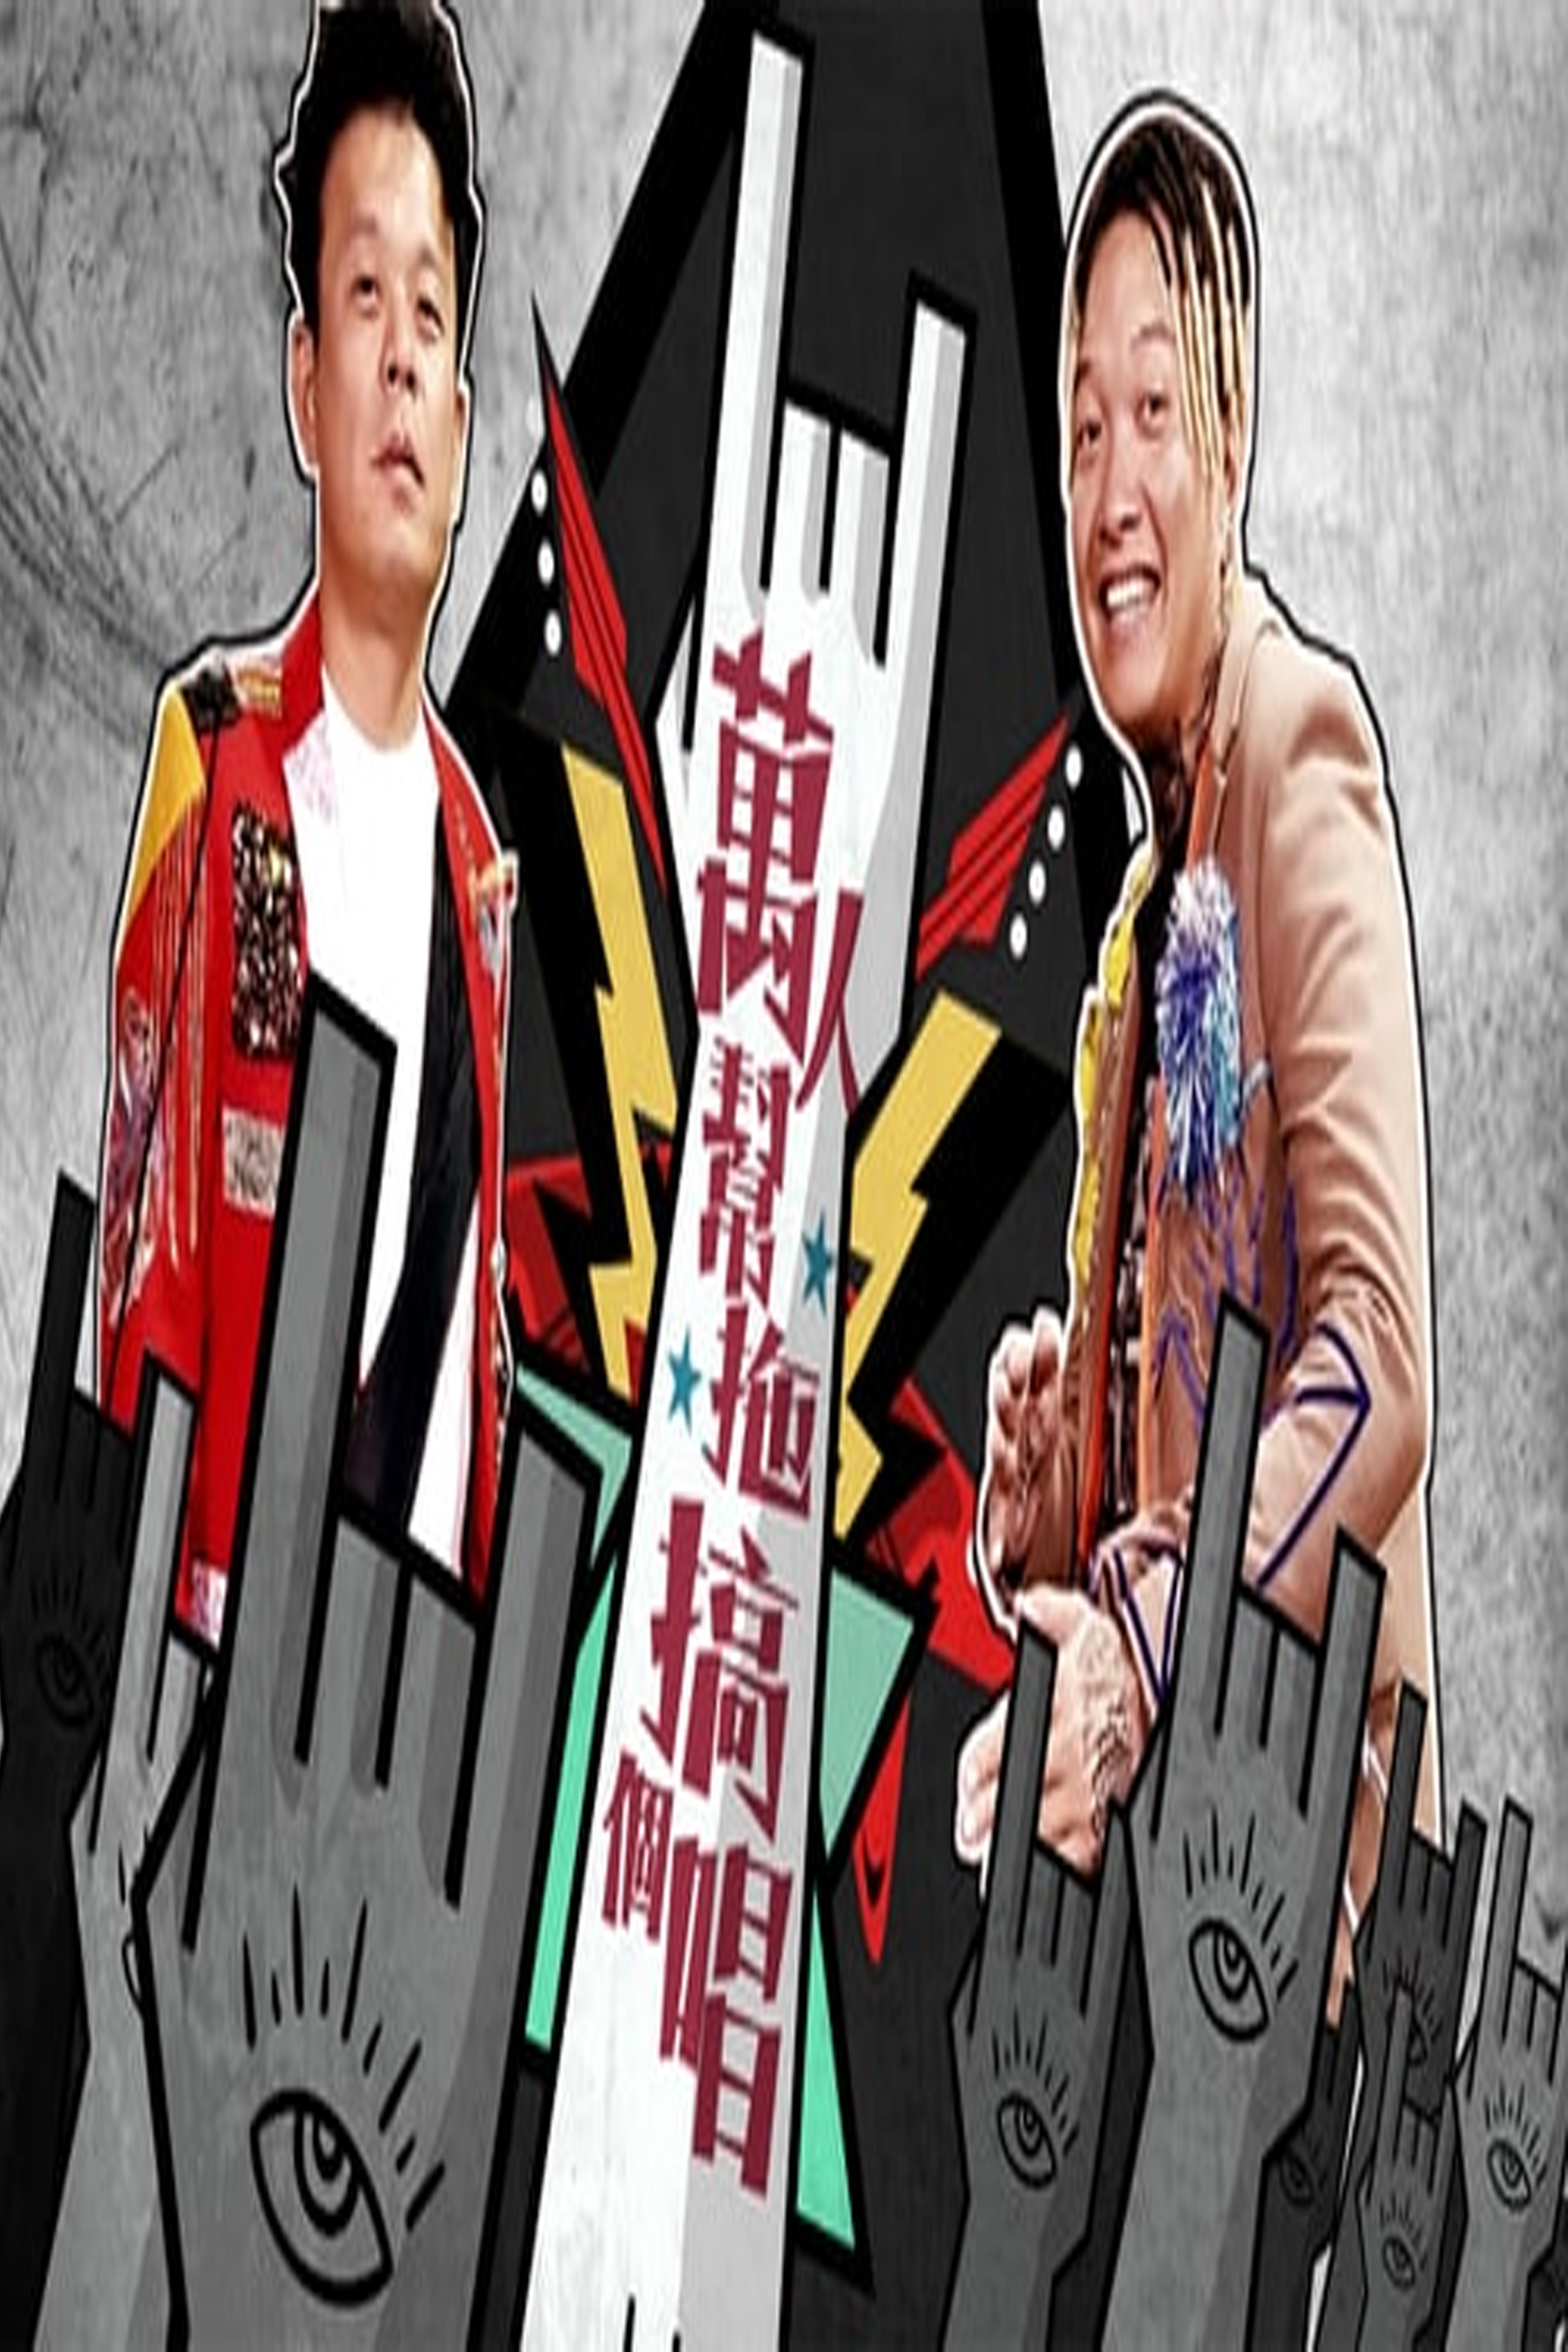 Calling Netizens (Full Version) - 萬人幫拖搞個唱 (足本版)